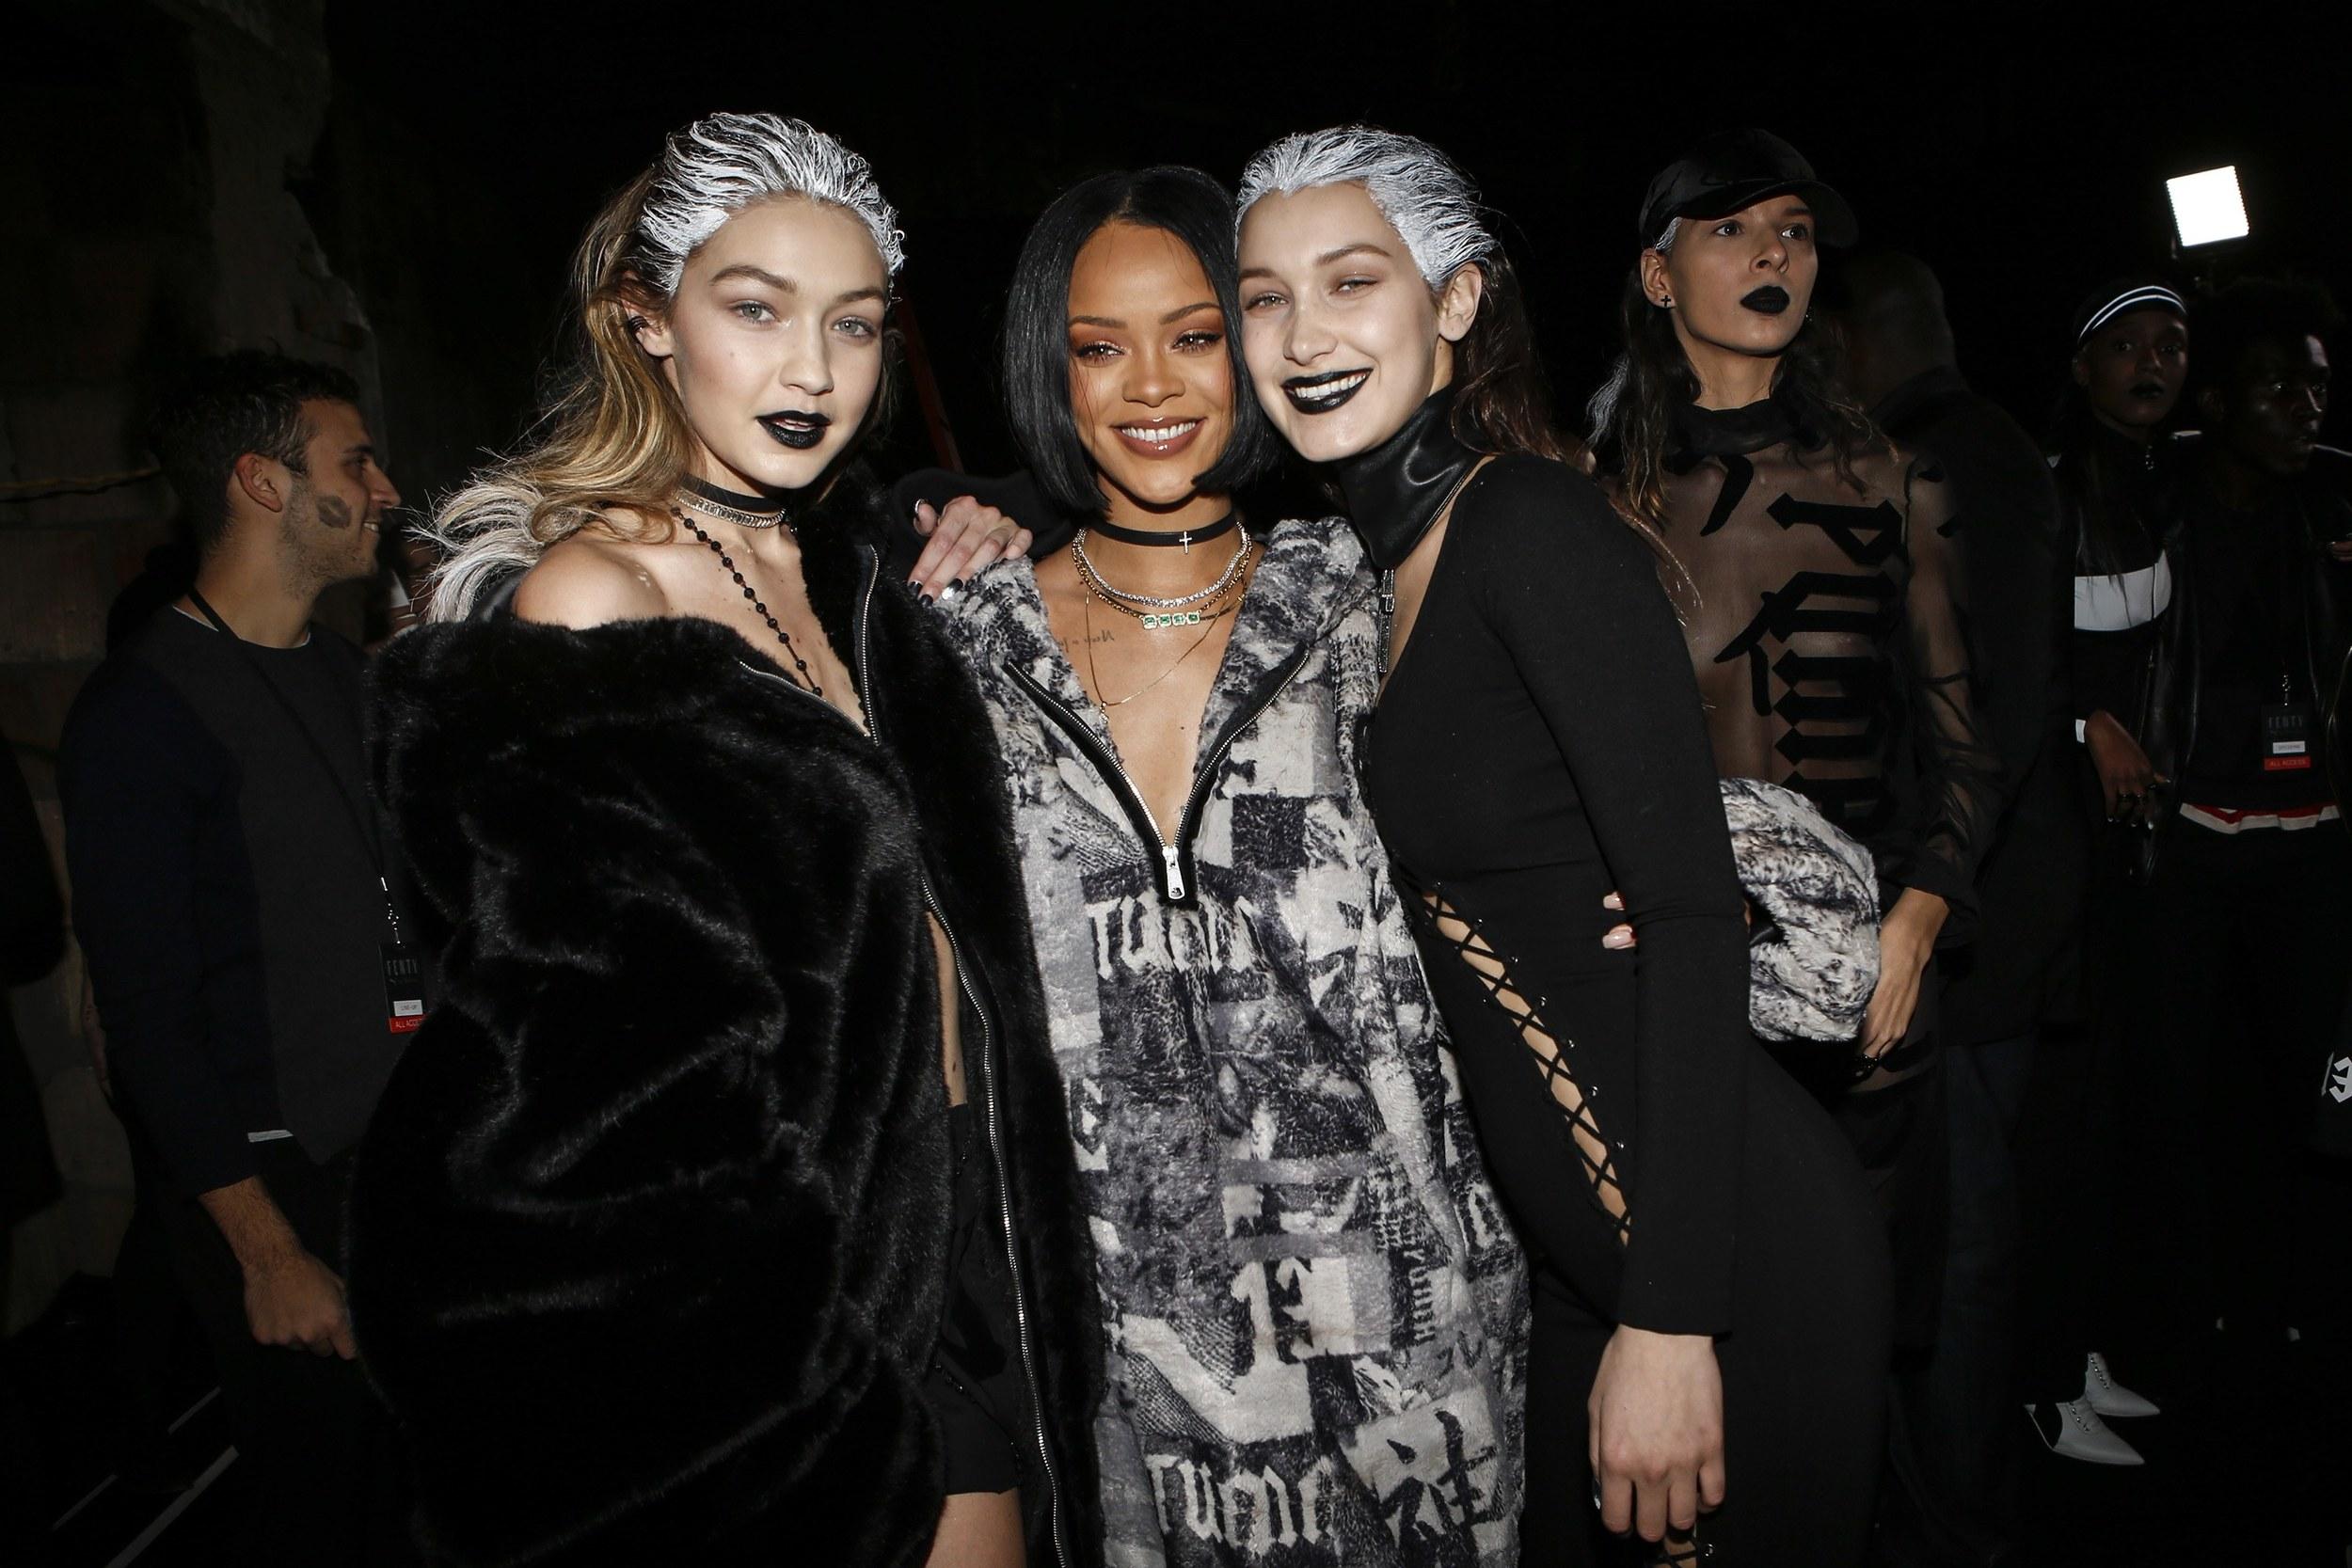 Rihanna backstage with models Gigi and Bella Hadid; image  via